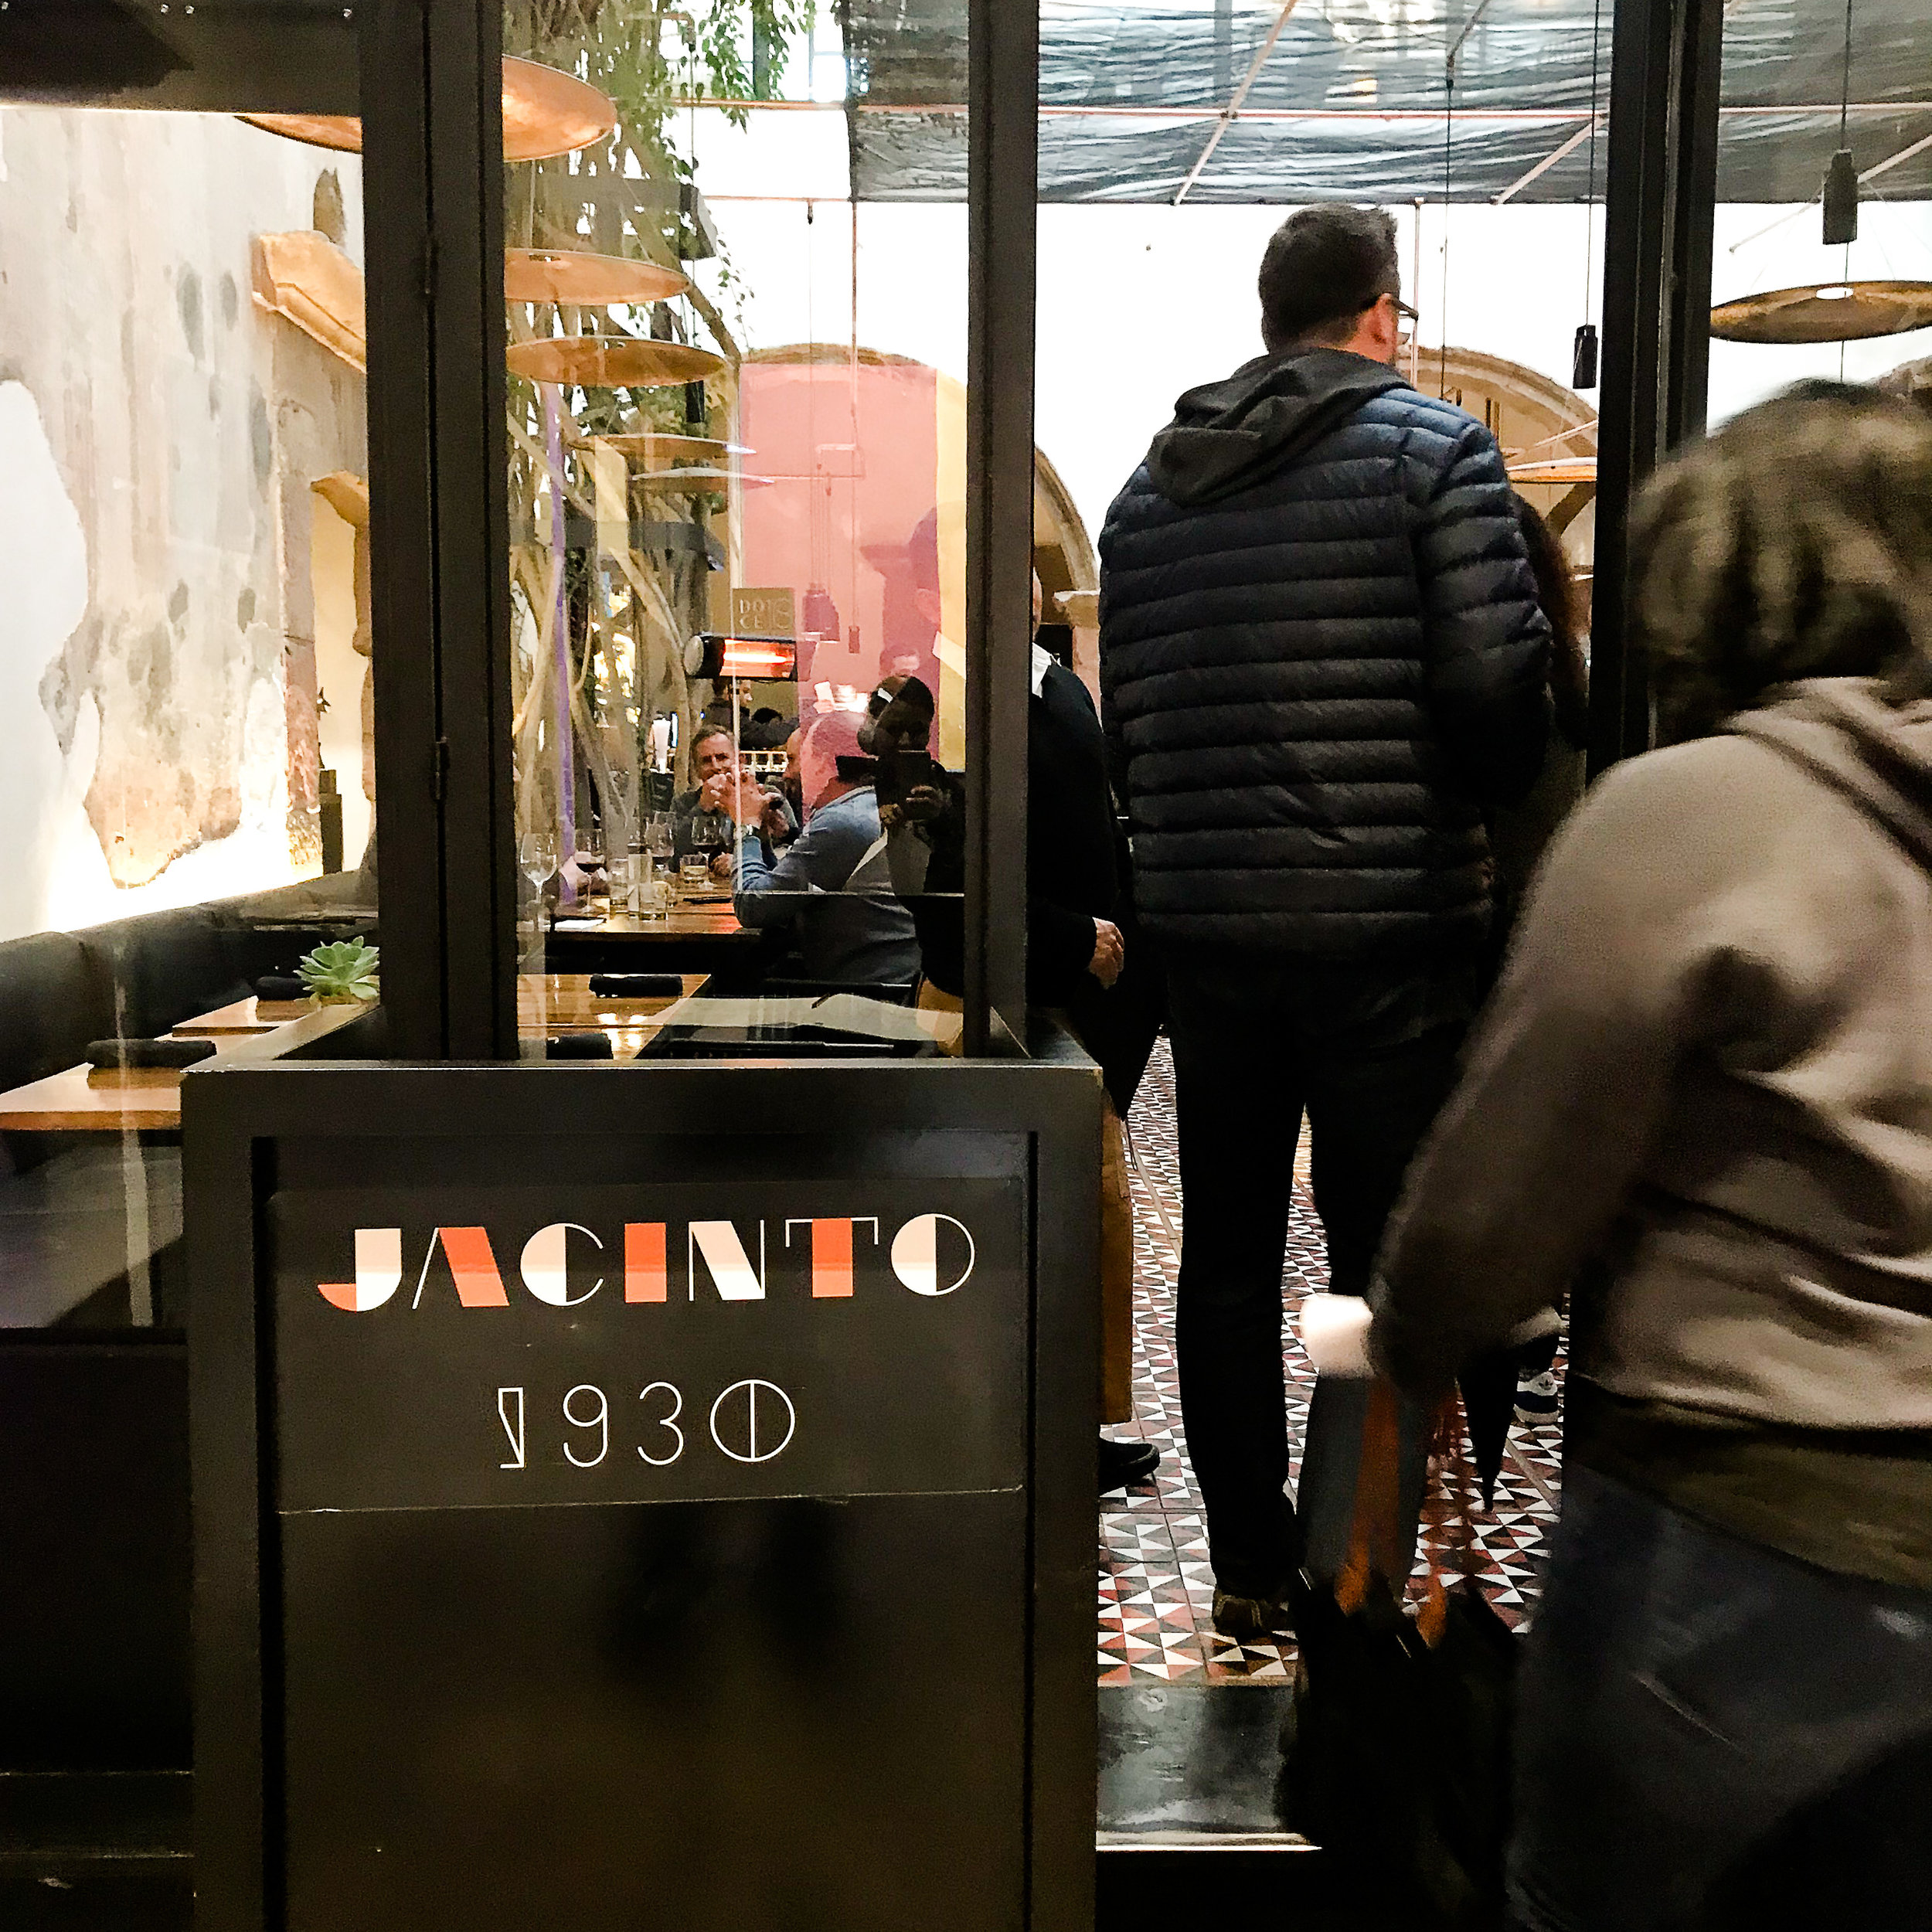 mexican-food-san-miguel-de-allende-restuarants-coffee-cafes-7.jpg